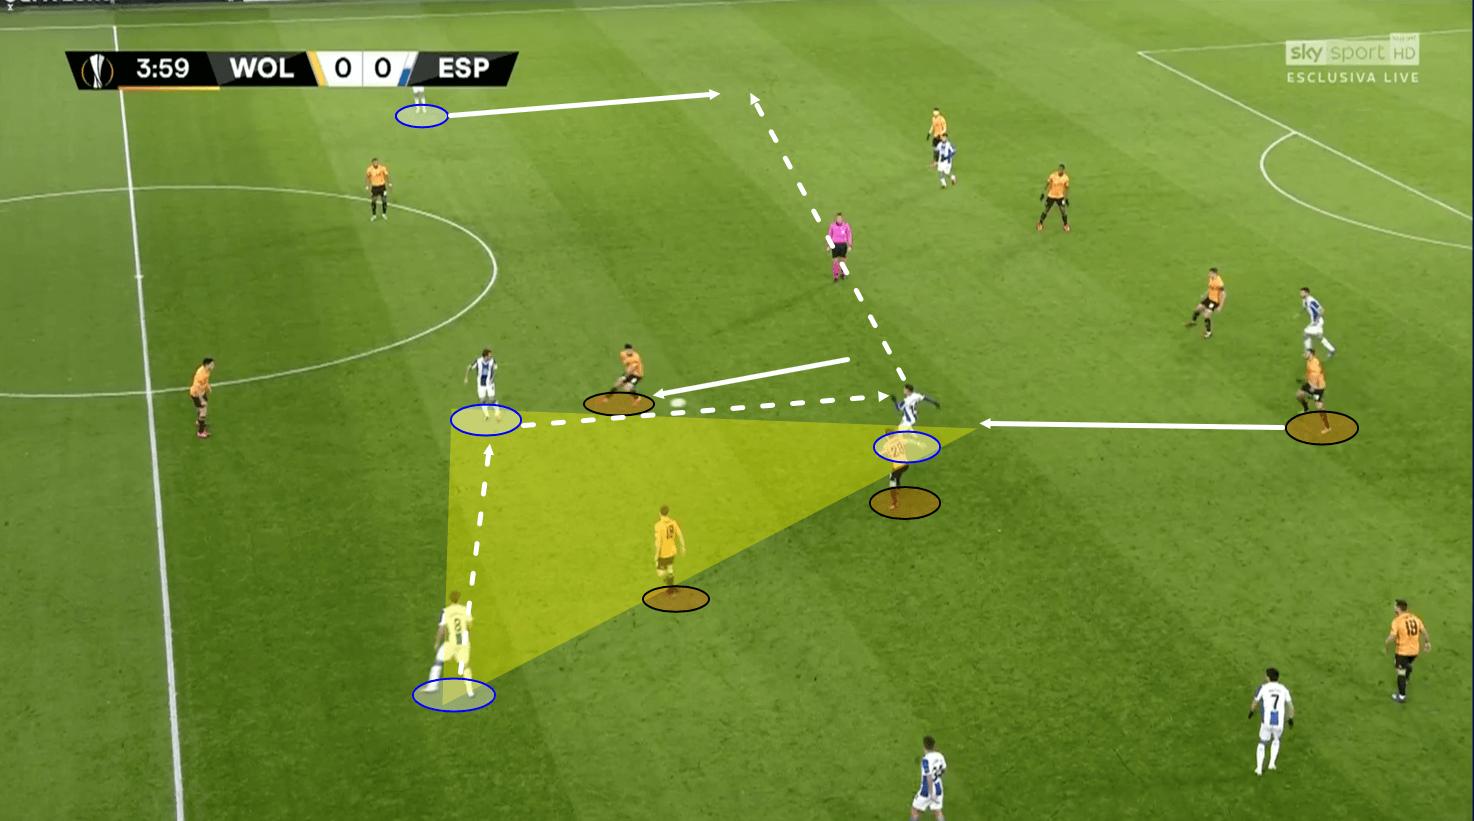 Europa League 2019/20: Wolves vs Espanyol - tactical analysis tactics